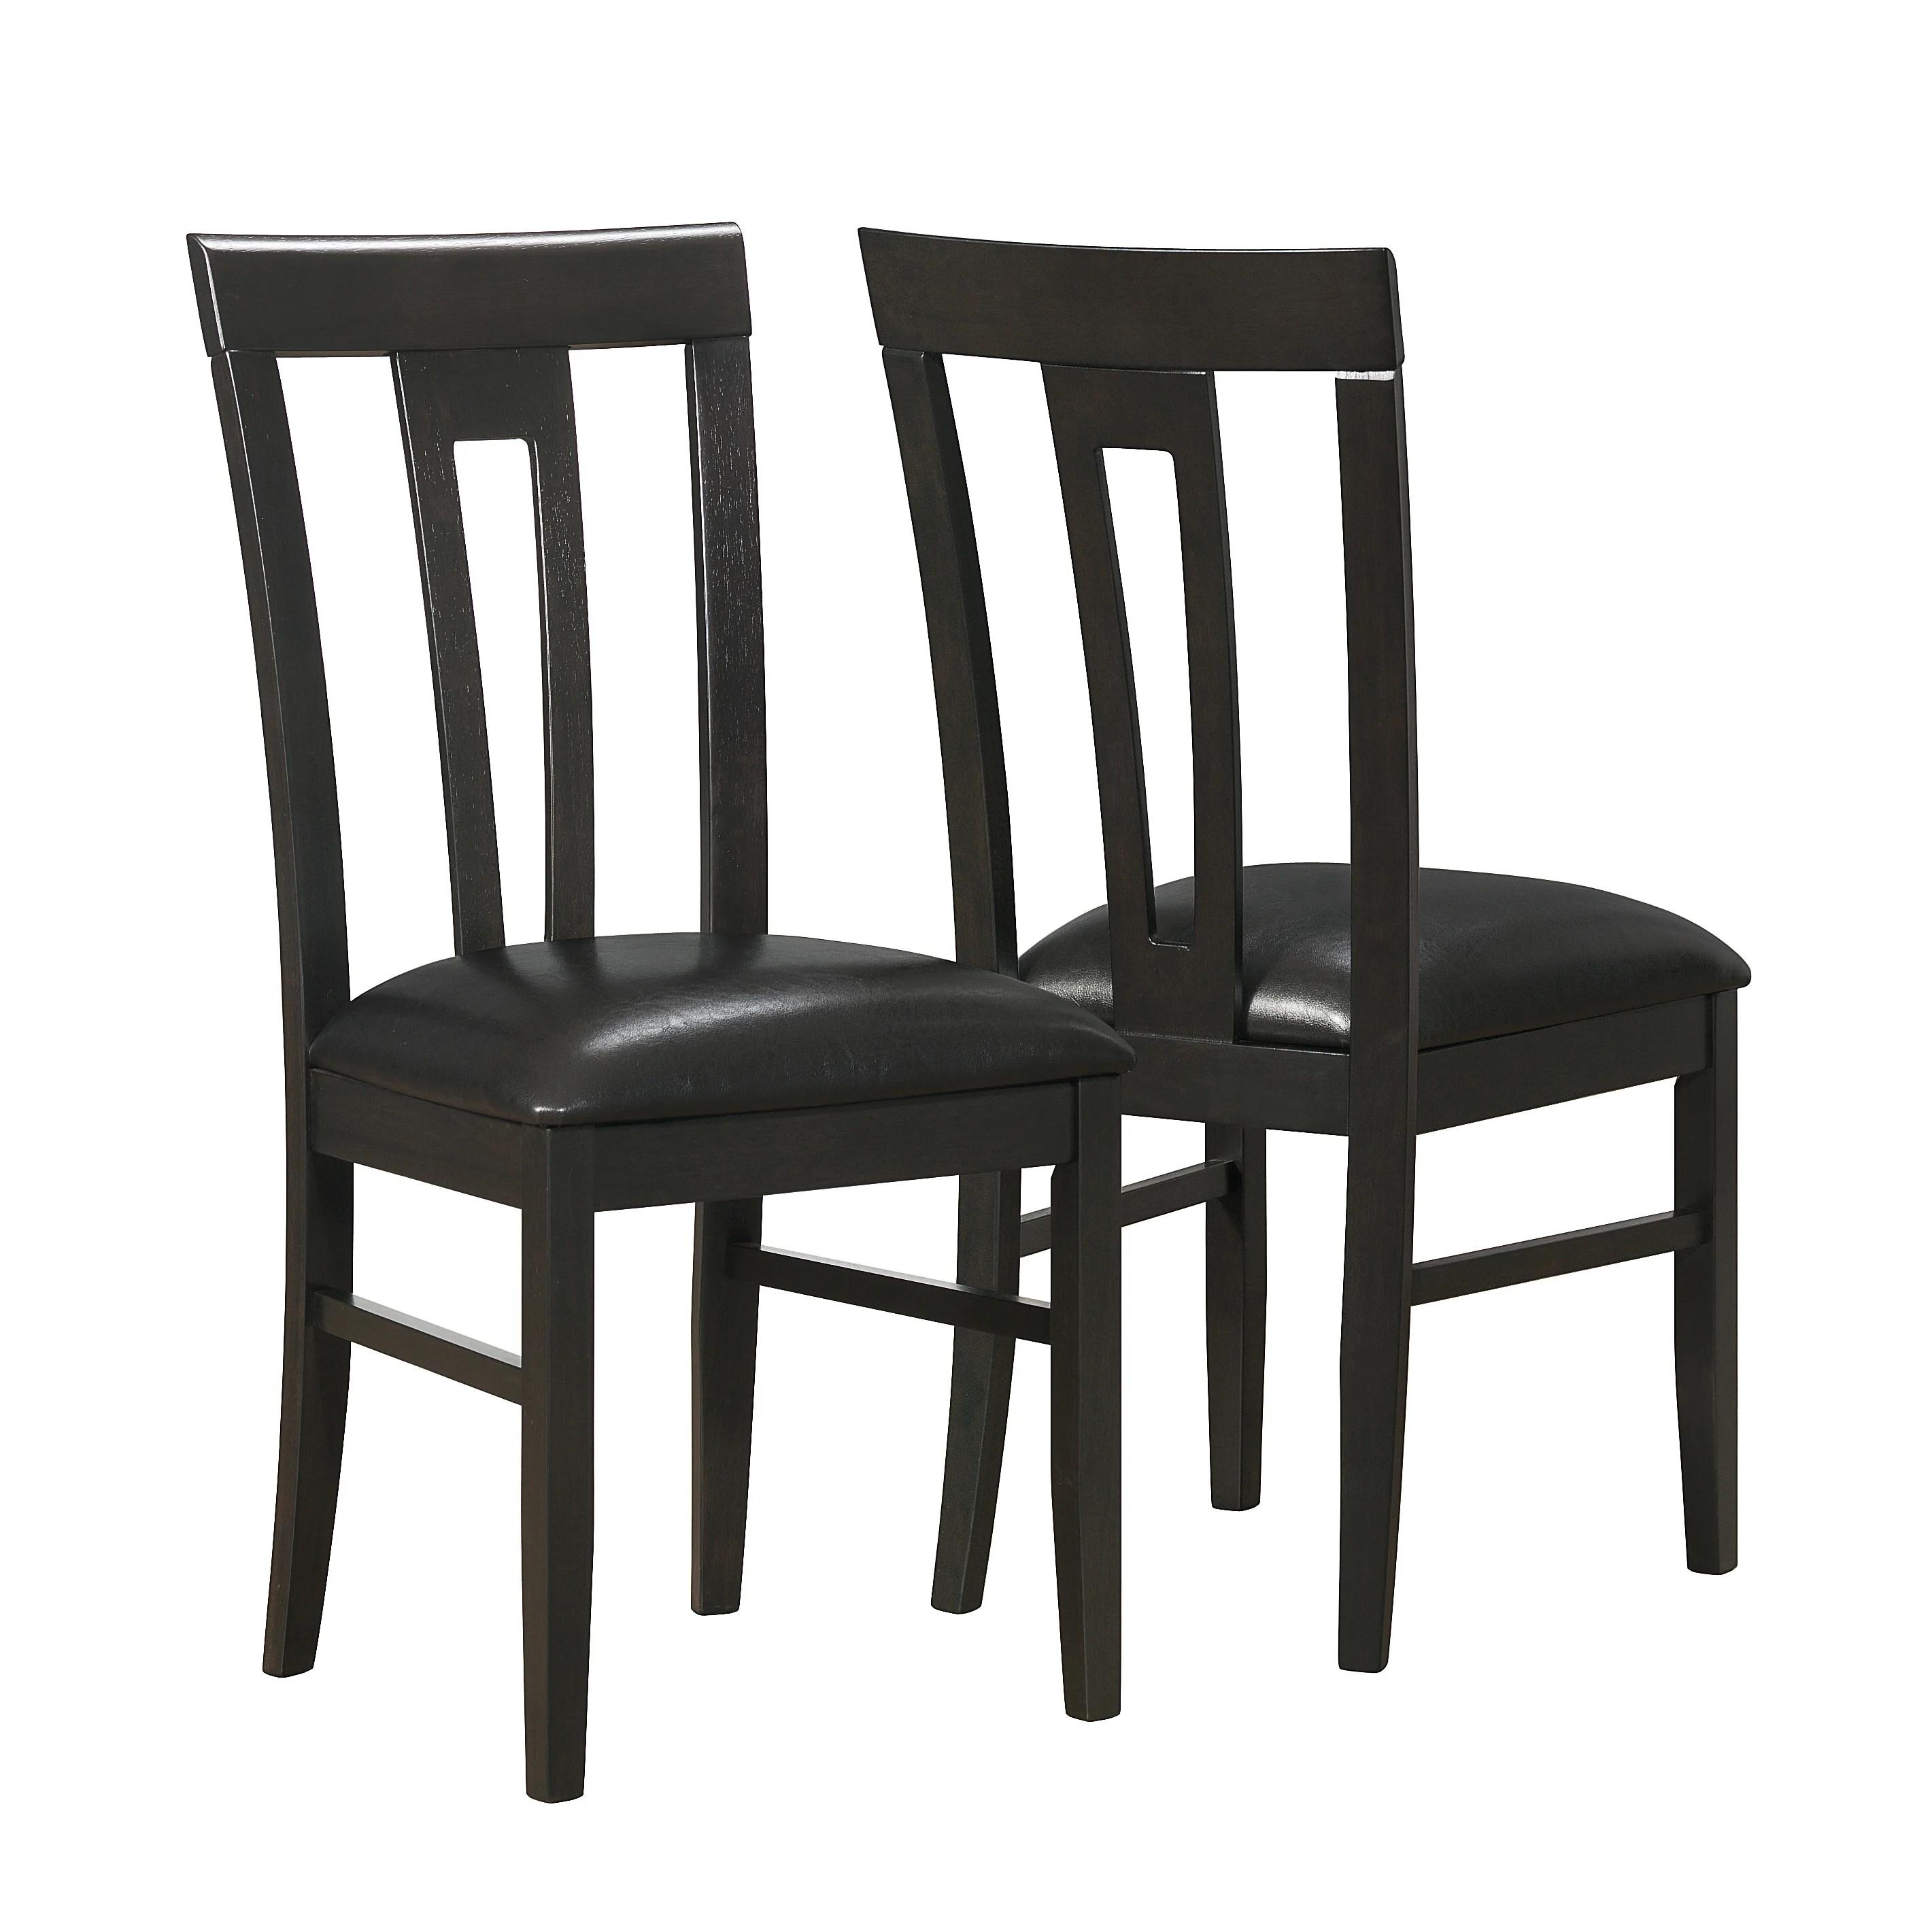 monarch dining chairs wheelchair cab side chair wayfair